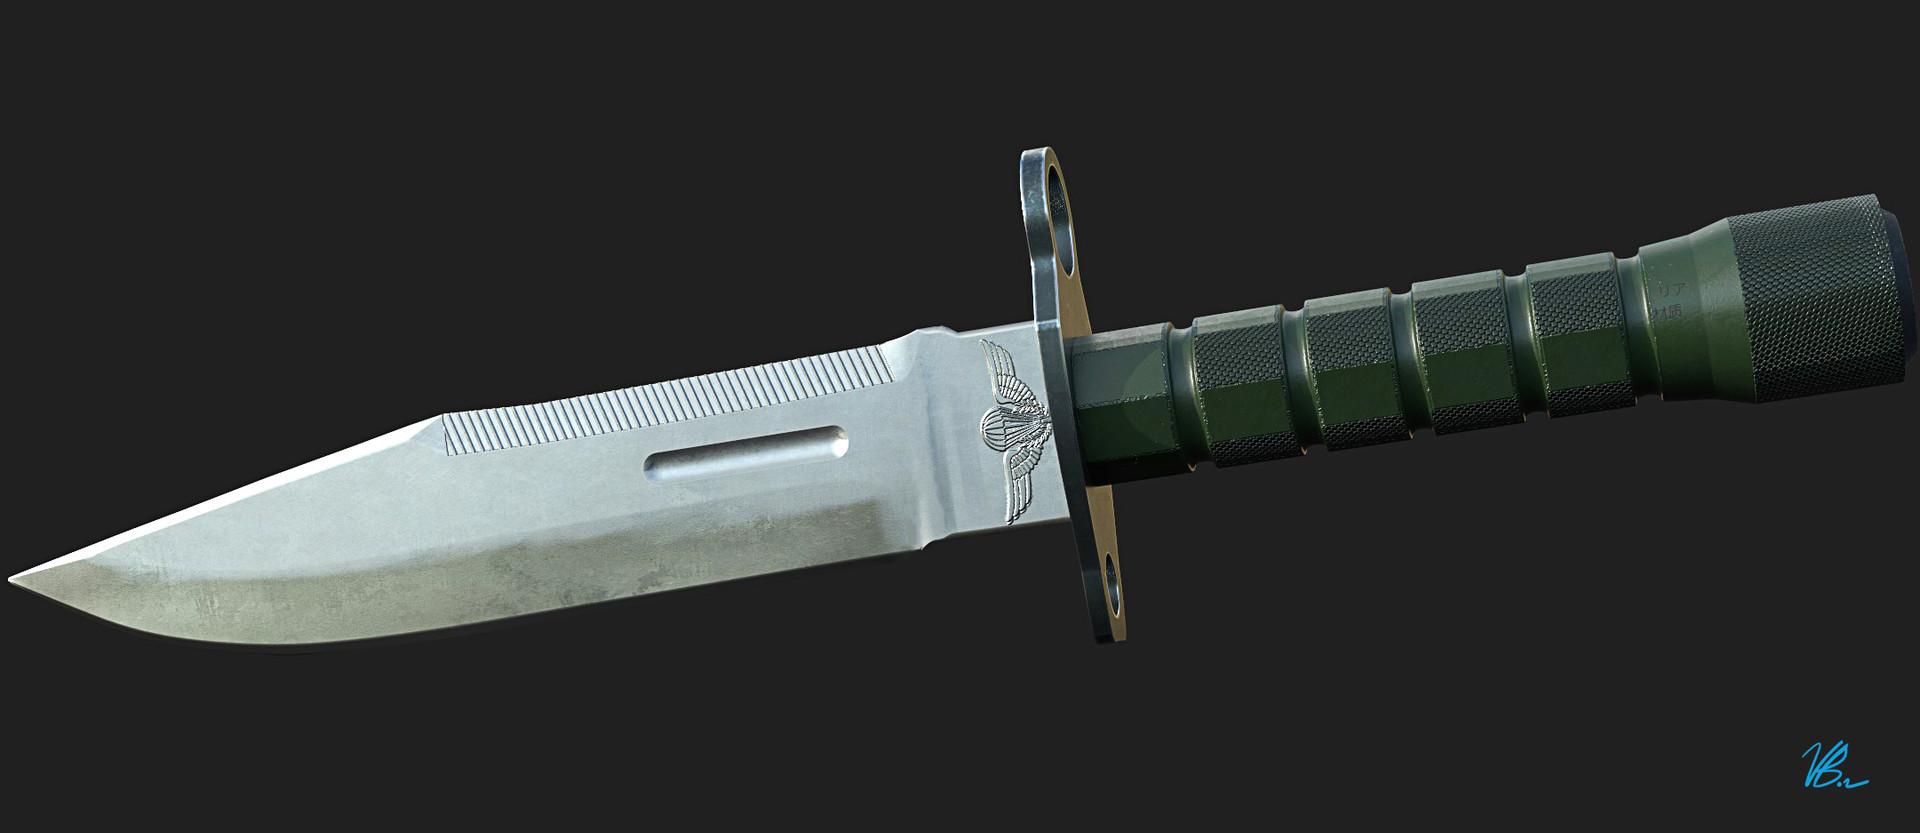 Vitor borsato phrobis knife 03 final